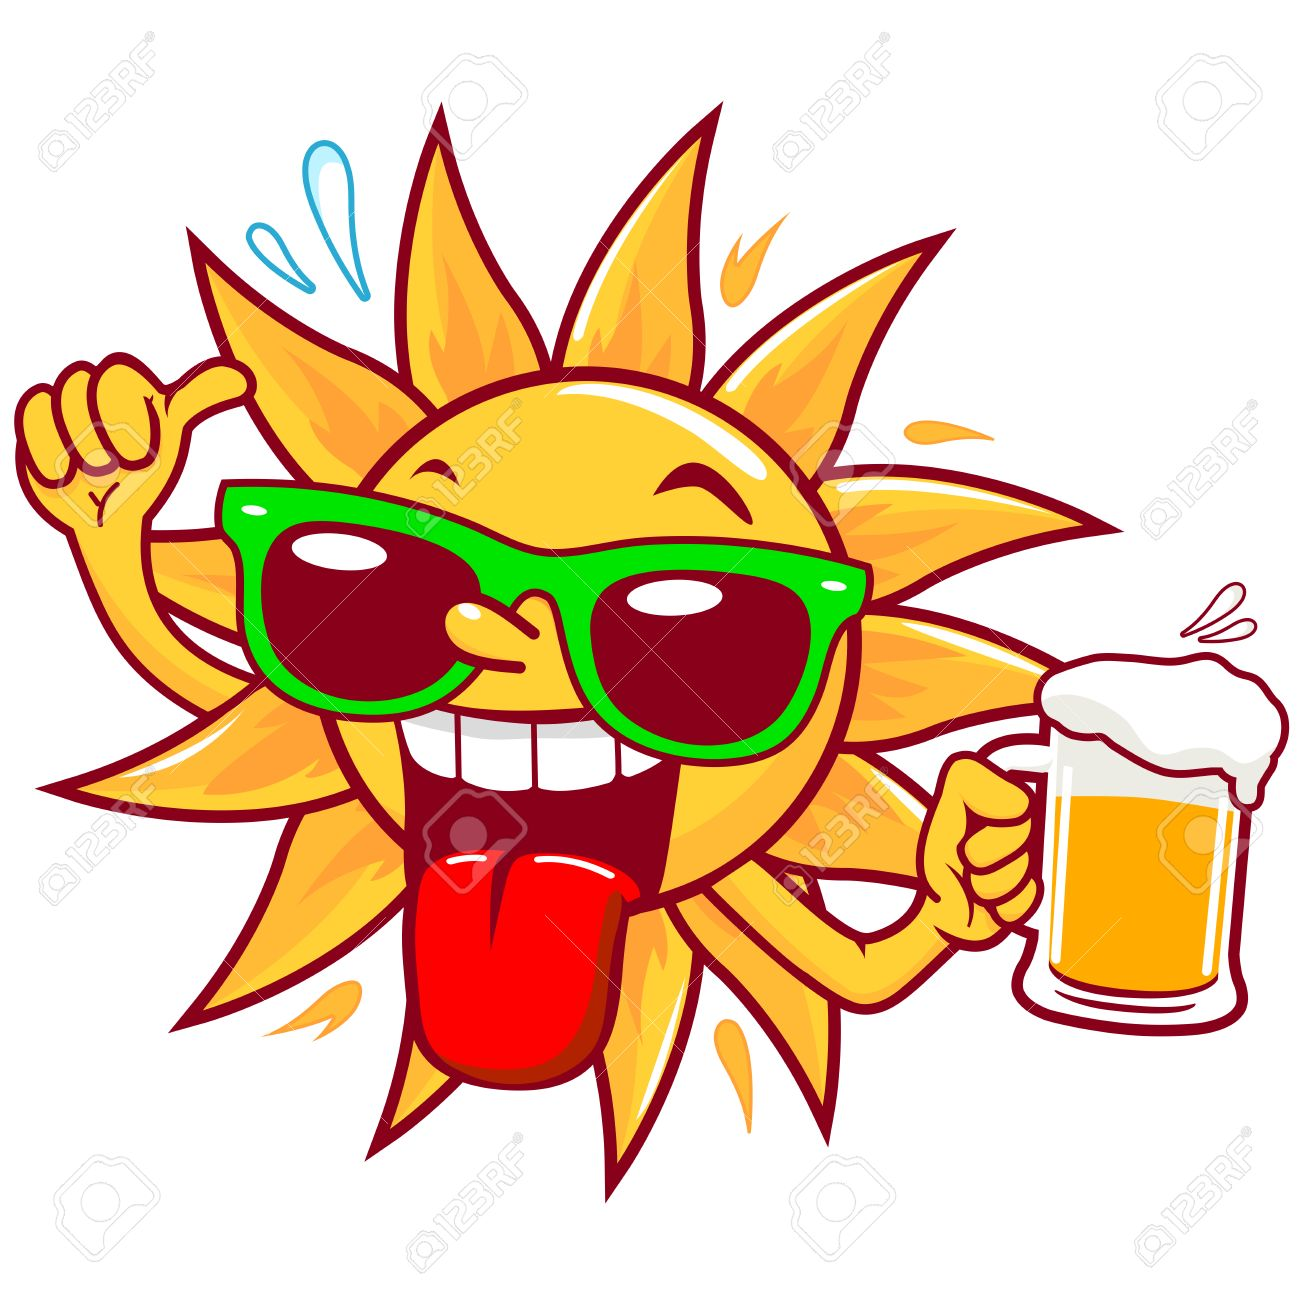 Cartoon sun with sunglasses drinking beer - 53647233